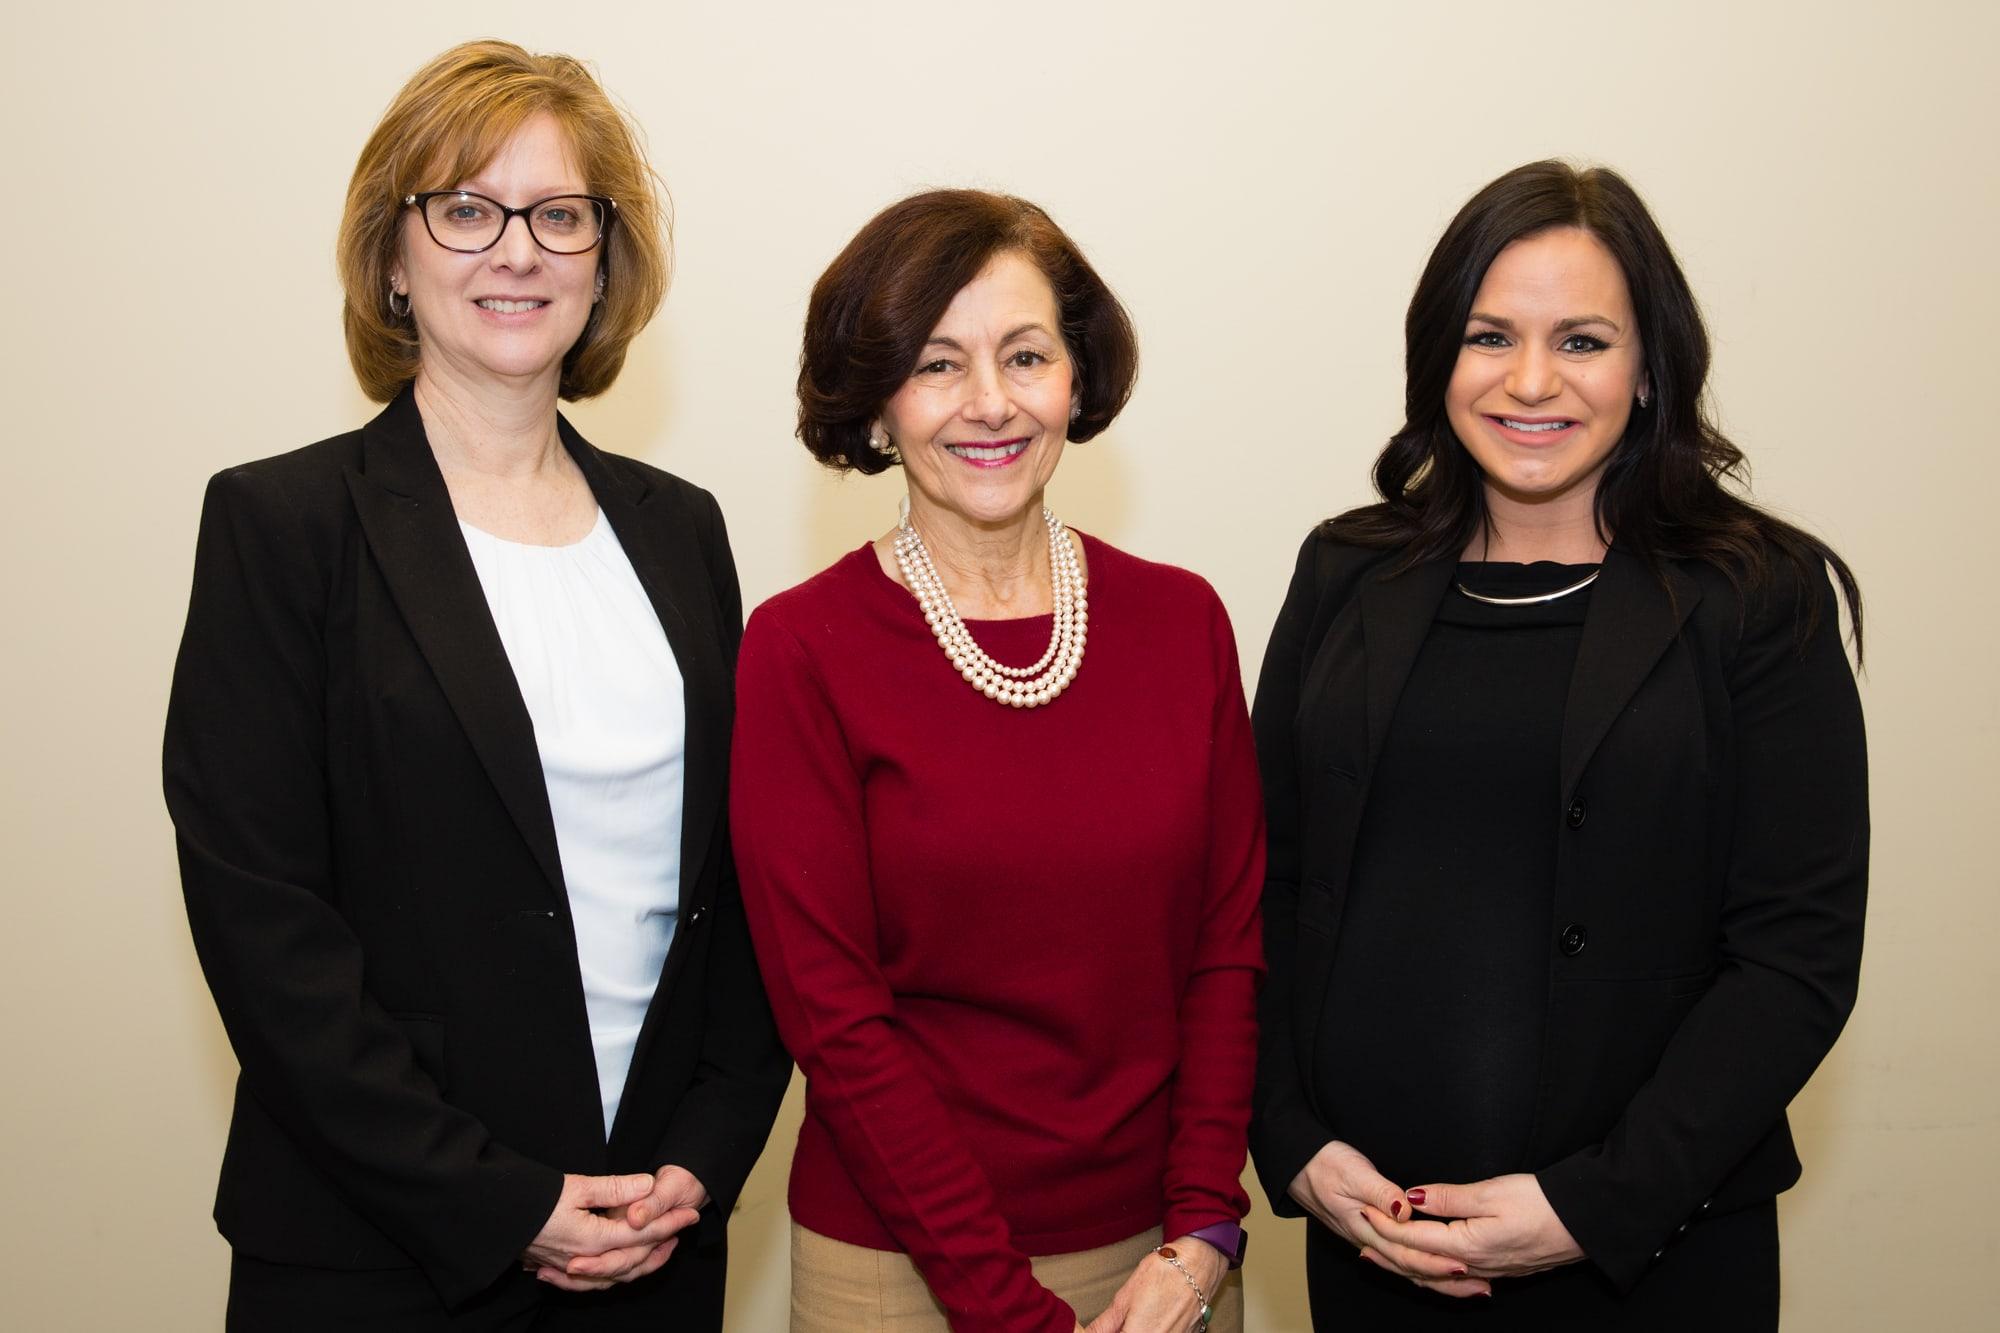 Sandy Guthrie, Carlyn Belcyzk and Erika Mack